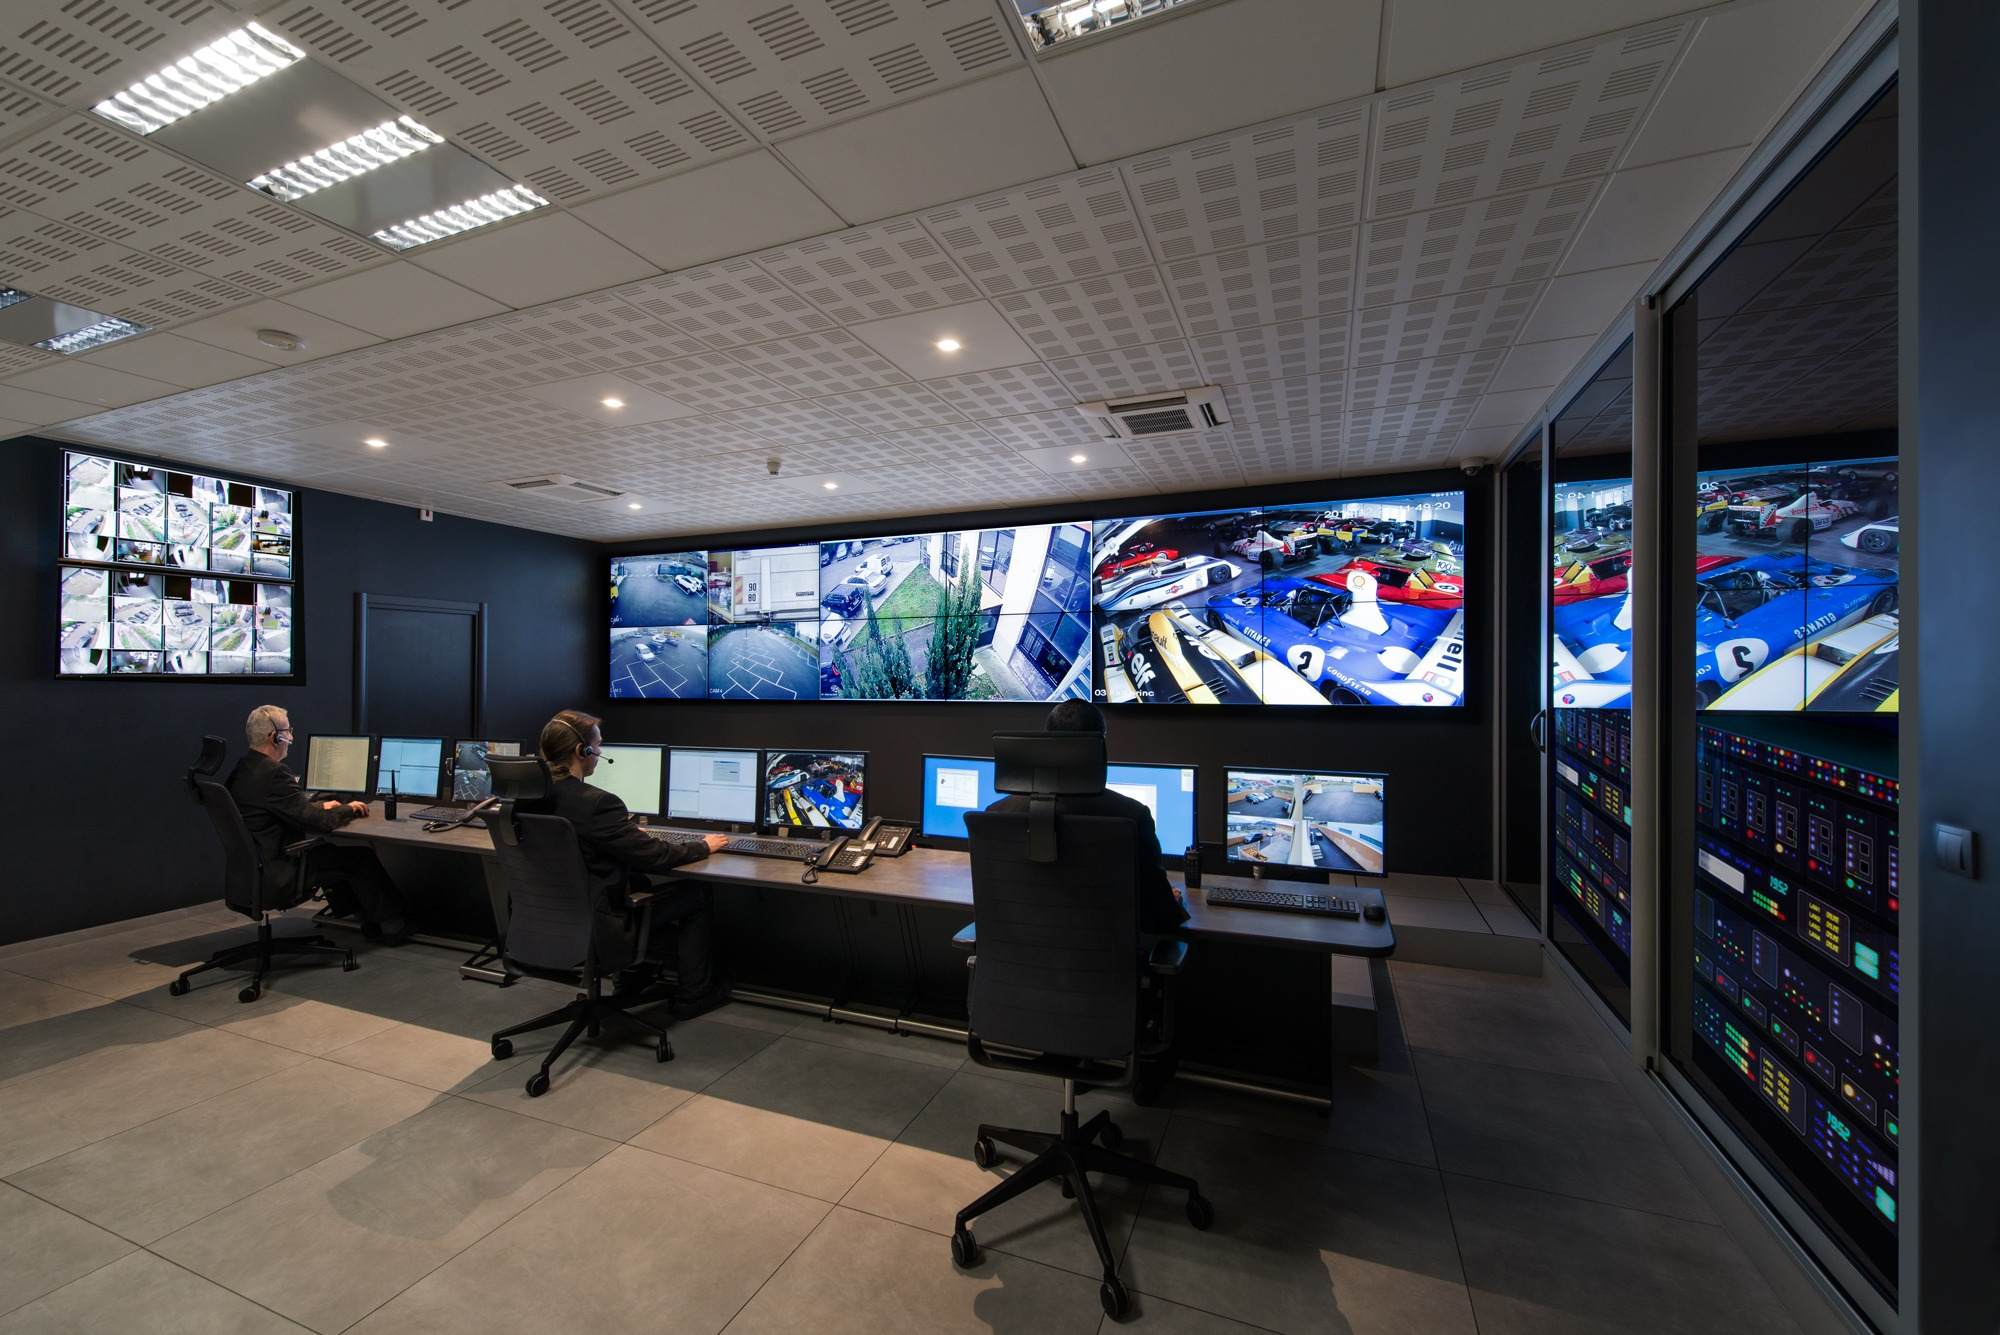 ci2t-marseille-videosurveillance-aixenprovence